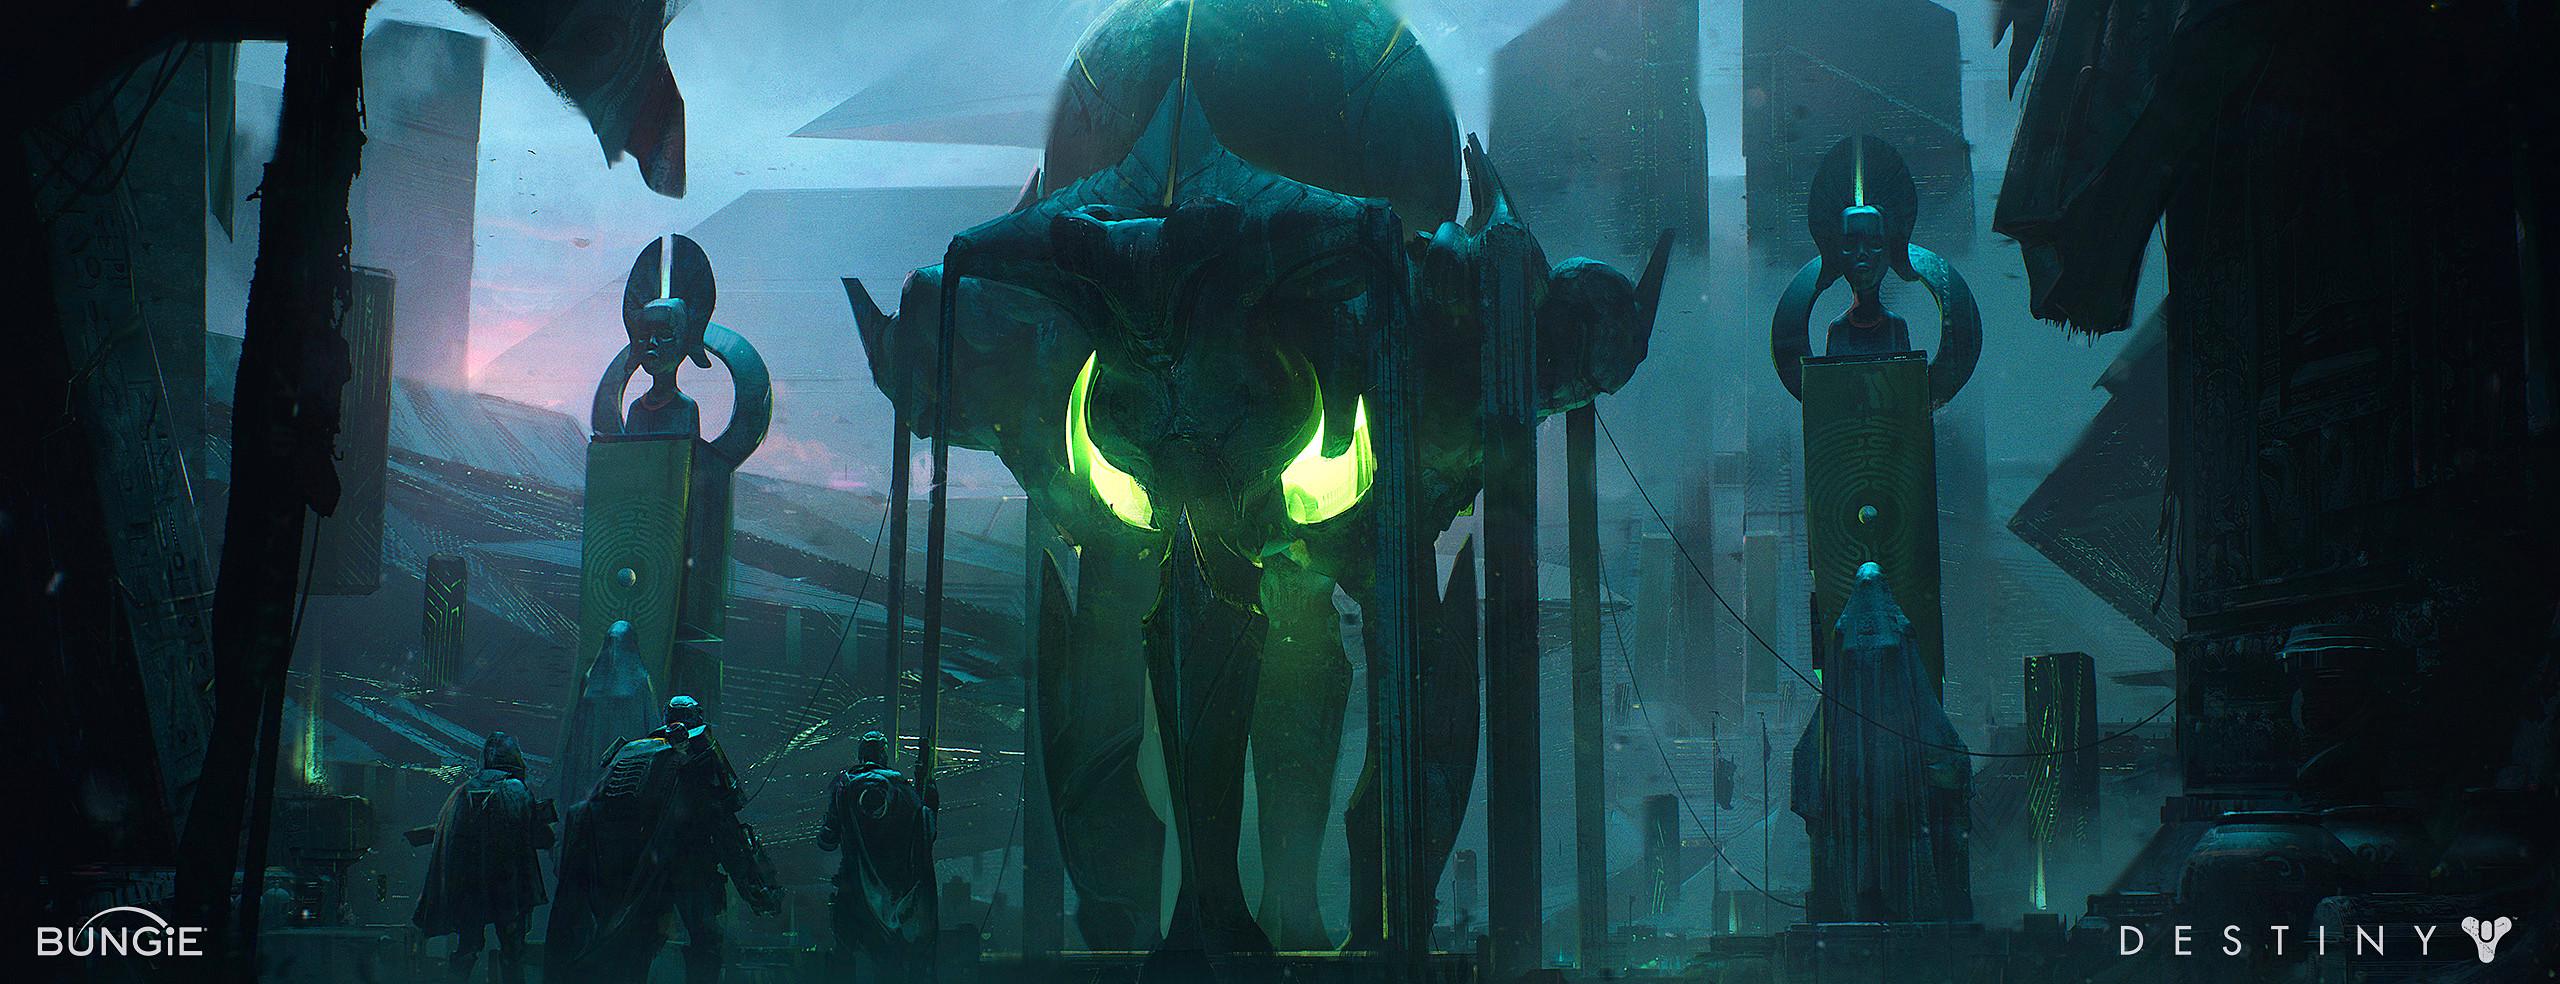 bungie fantasy scifi alien worldbuilding design photoshop